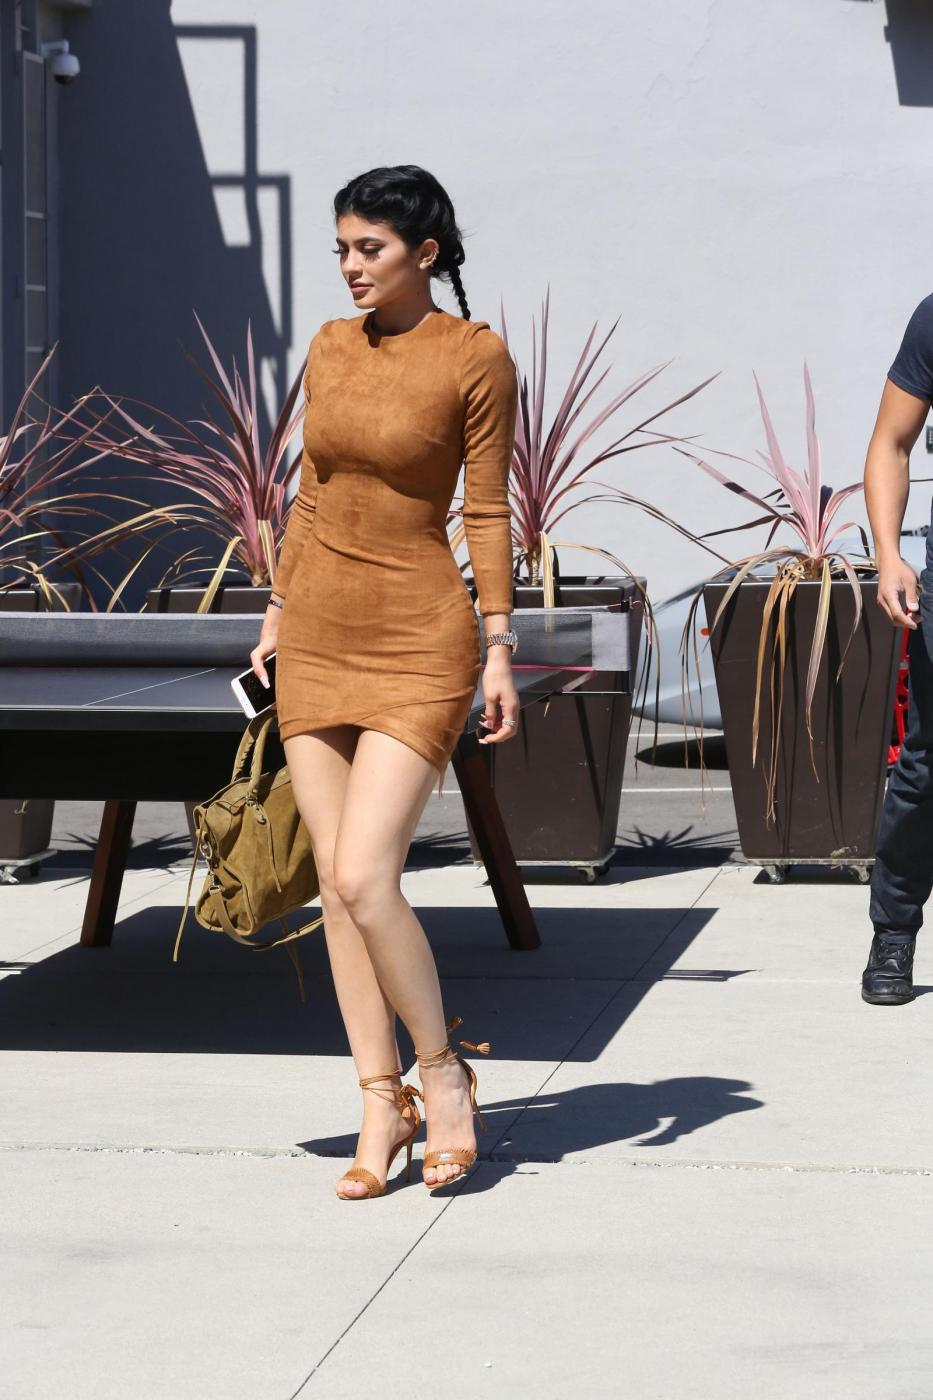 Kylie Jenner sexy: miniabito, trucco da Barbie e Ferrari6